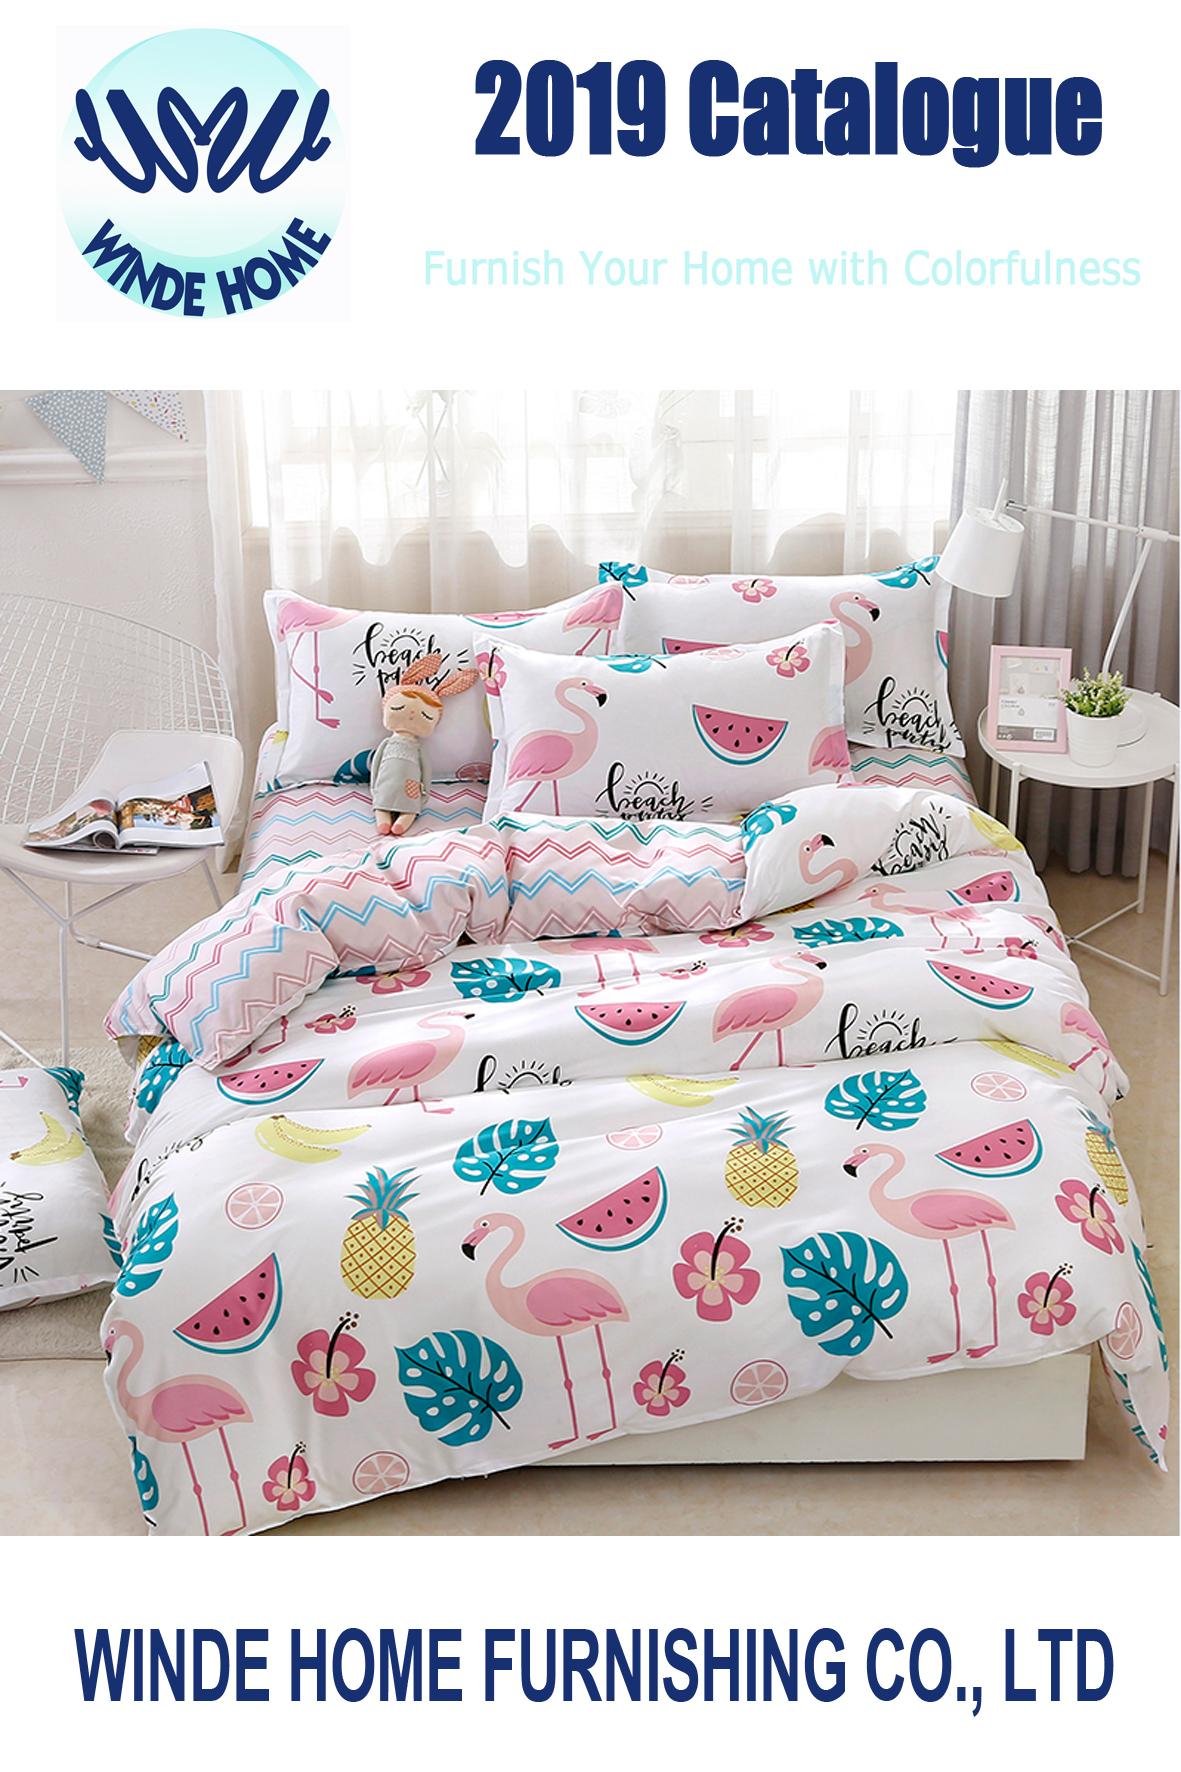 Product Catalogs Hangzhou Winde Home Furnishing Co Ltd